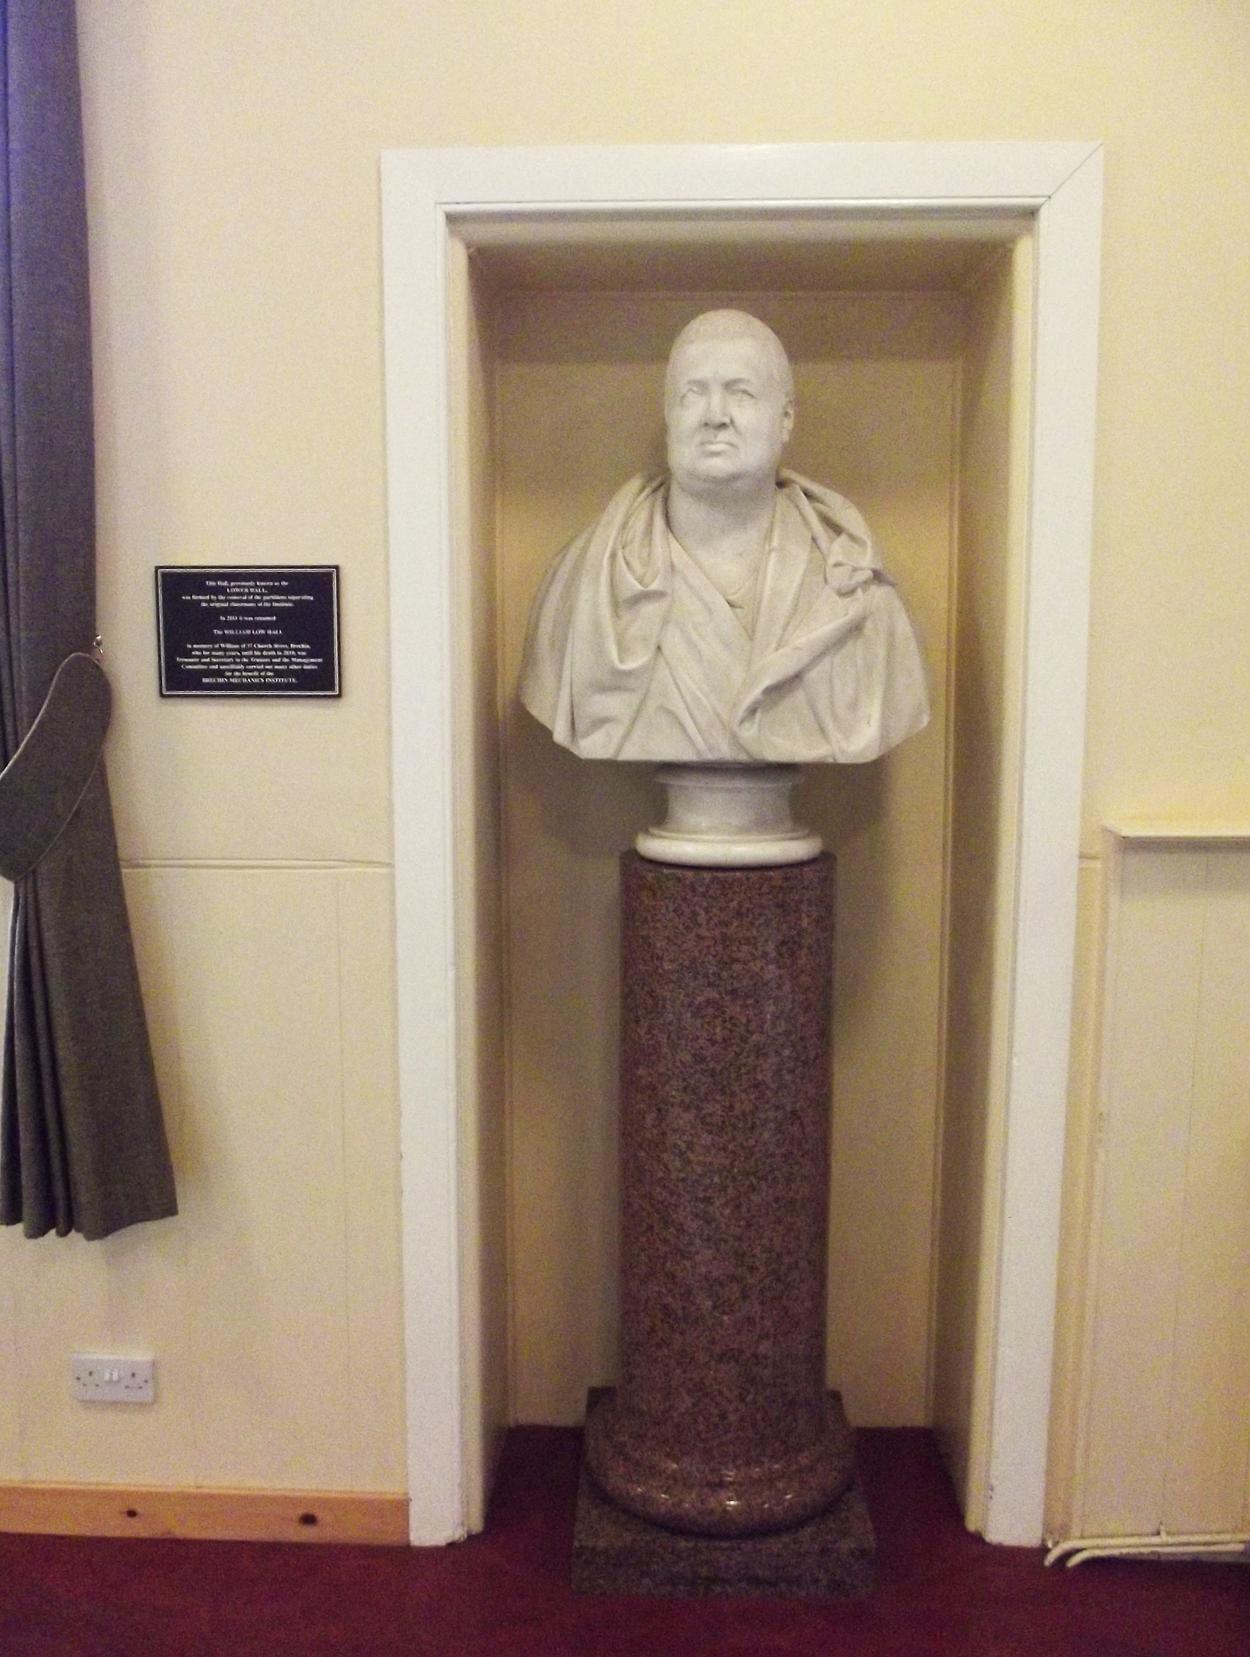 Lord Ramsay - 11th Earl of Dalhousie